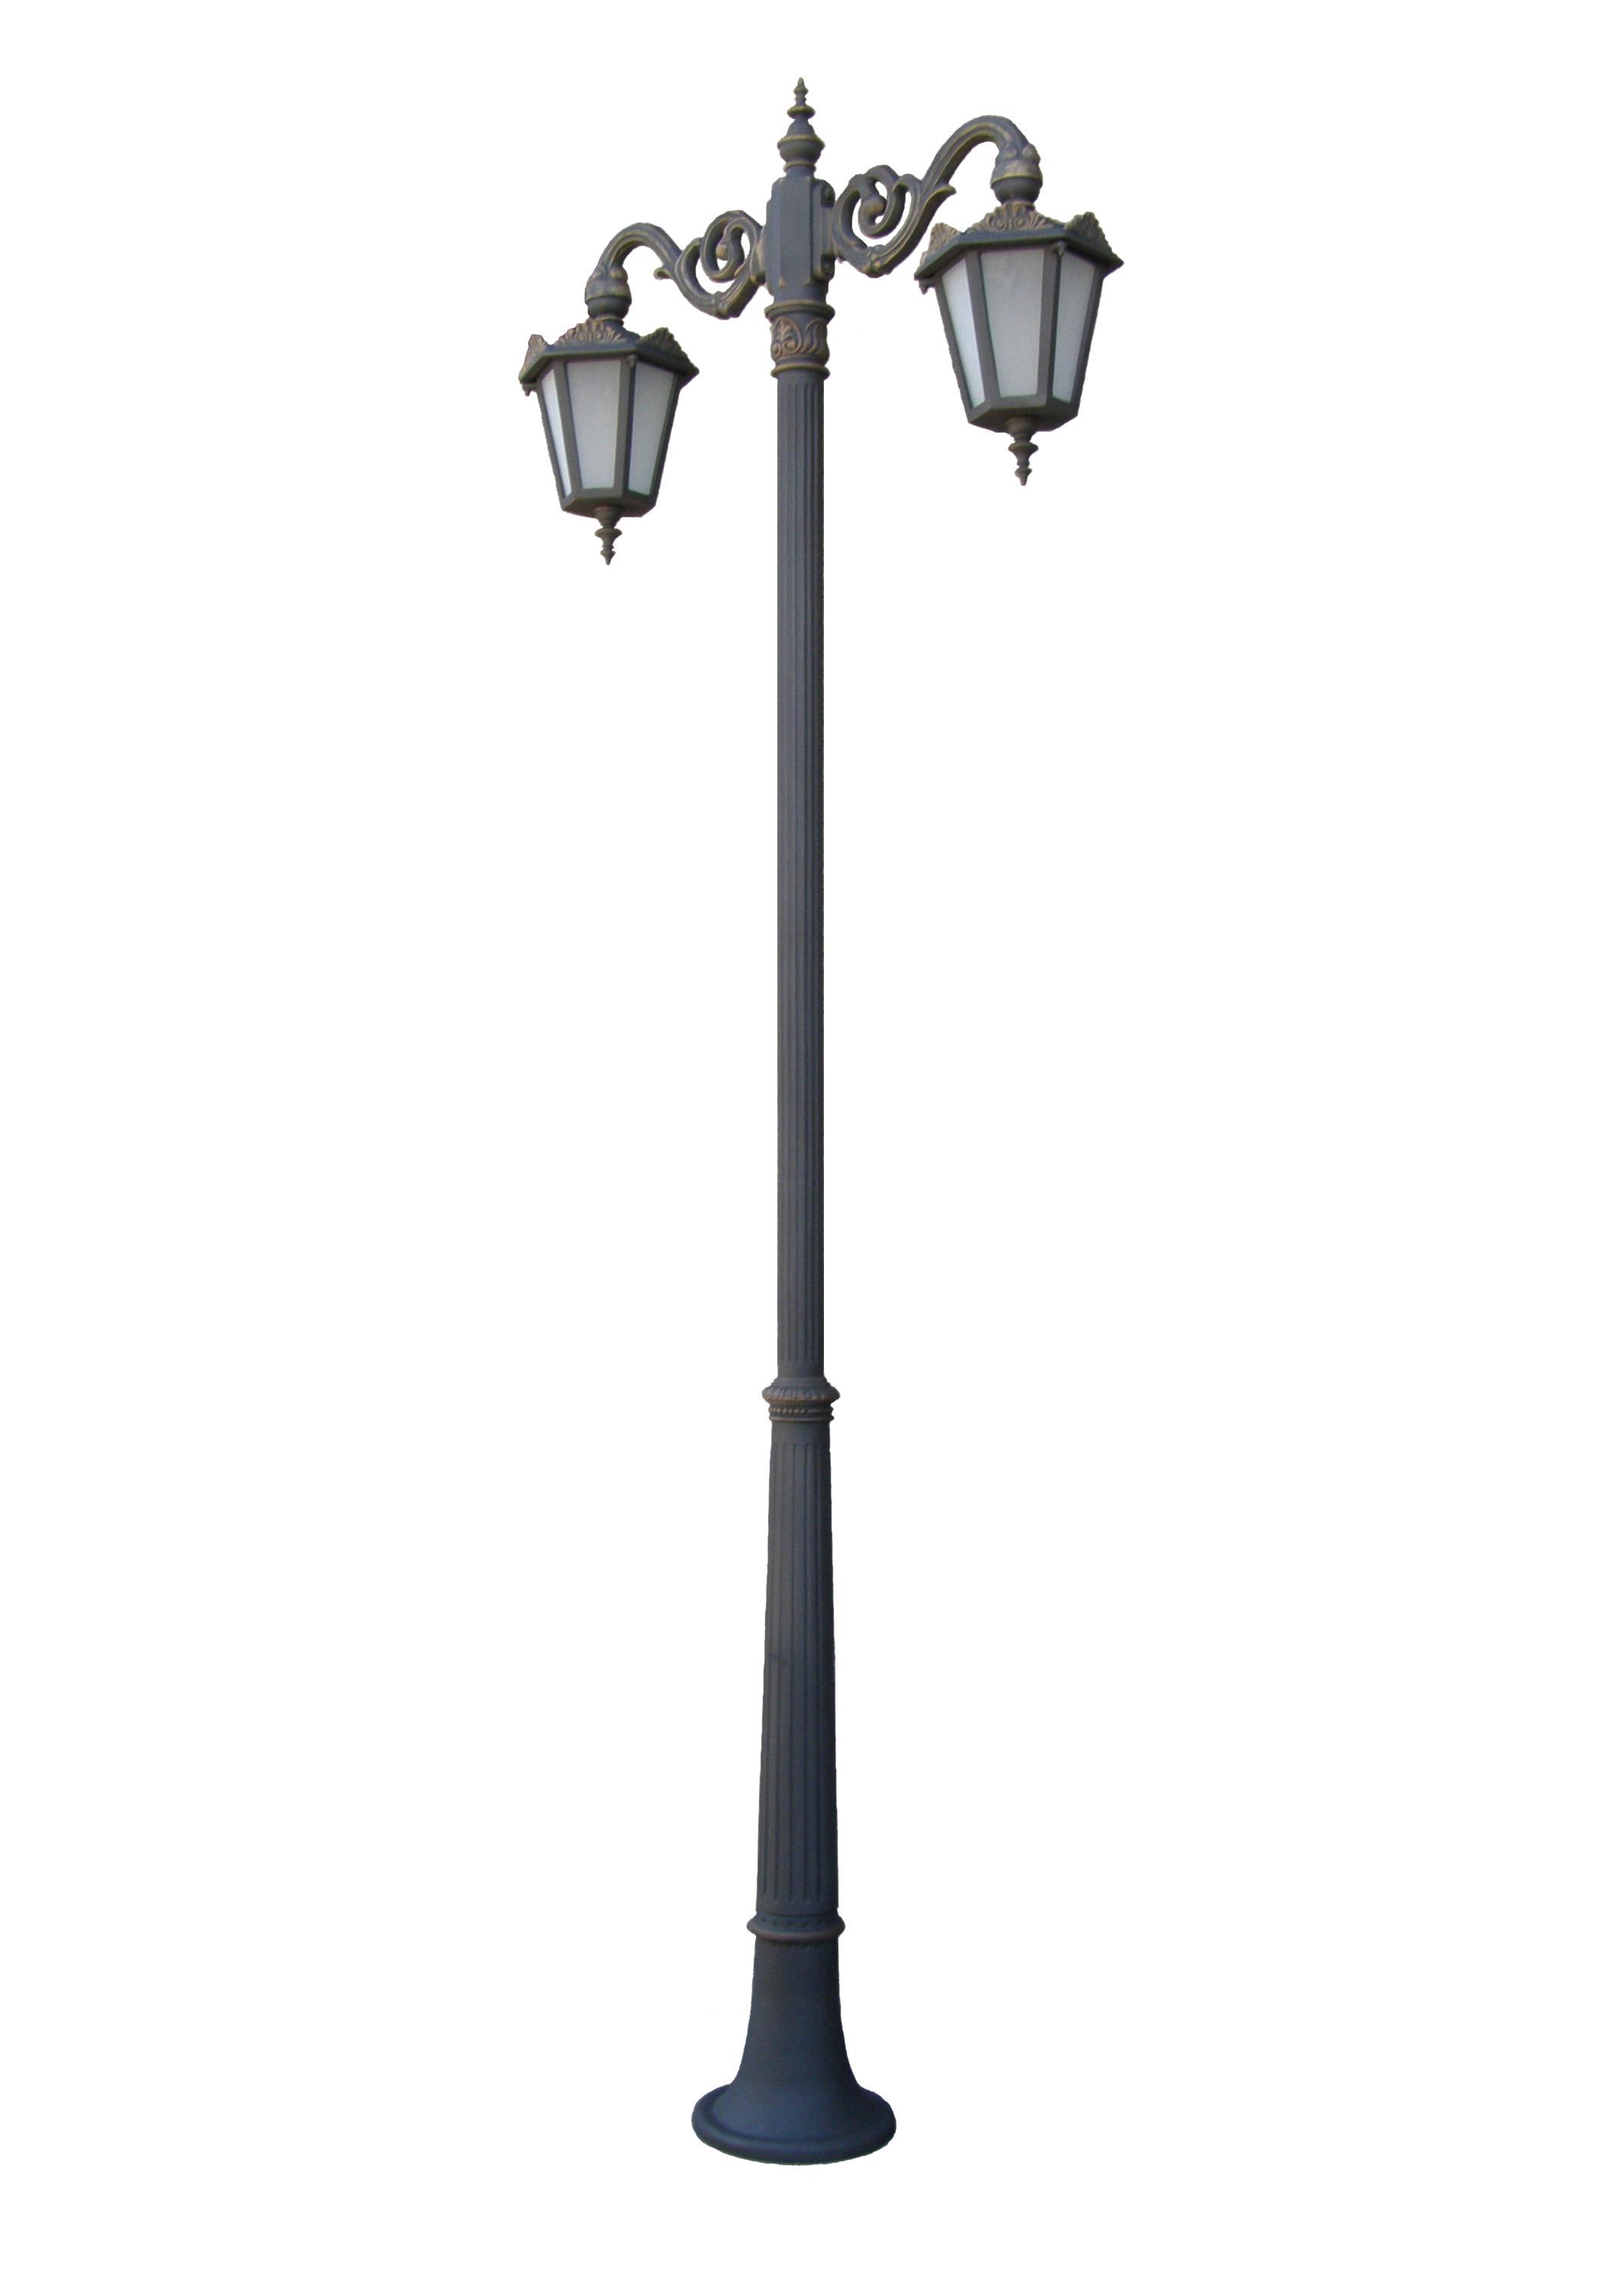 Stalpi ornamentali pentru iluminat stradal, parcuri, gradini BRAMAL LIGHT - Poza 20